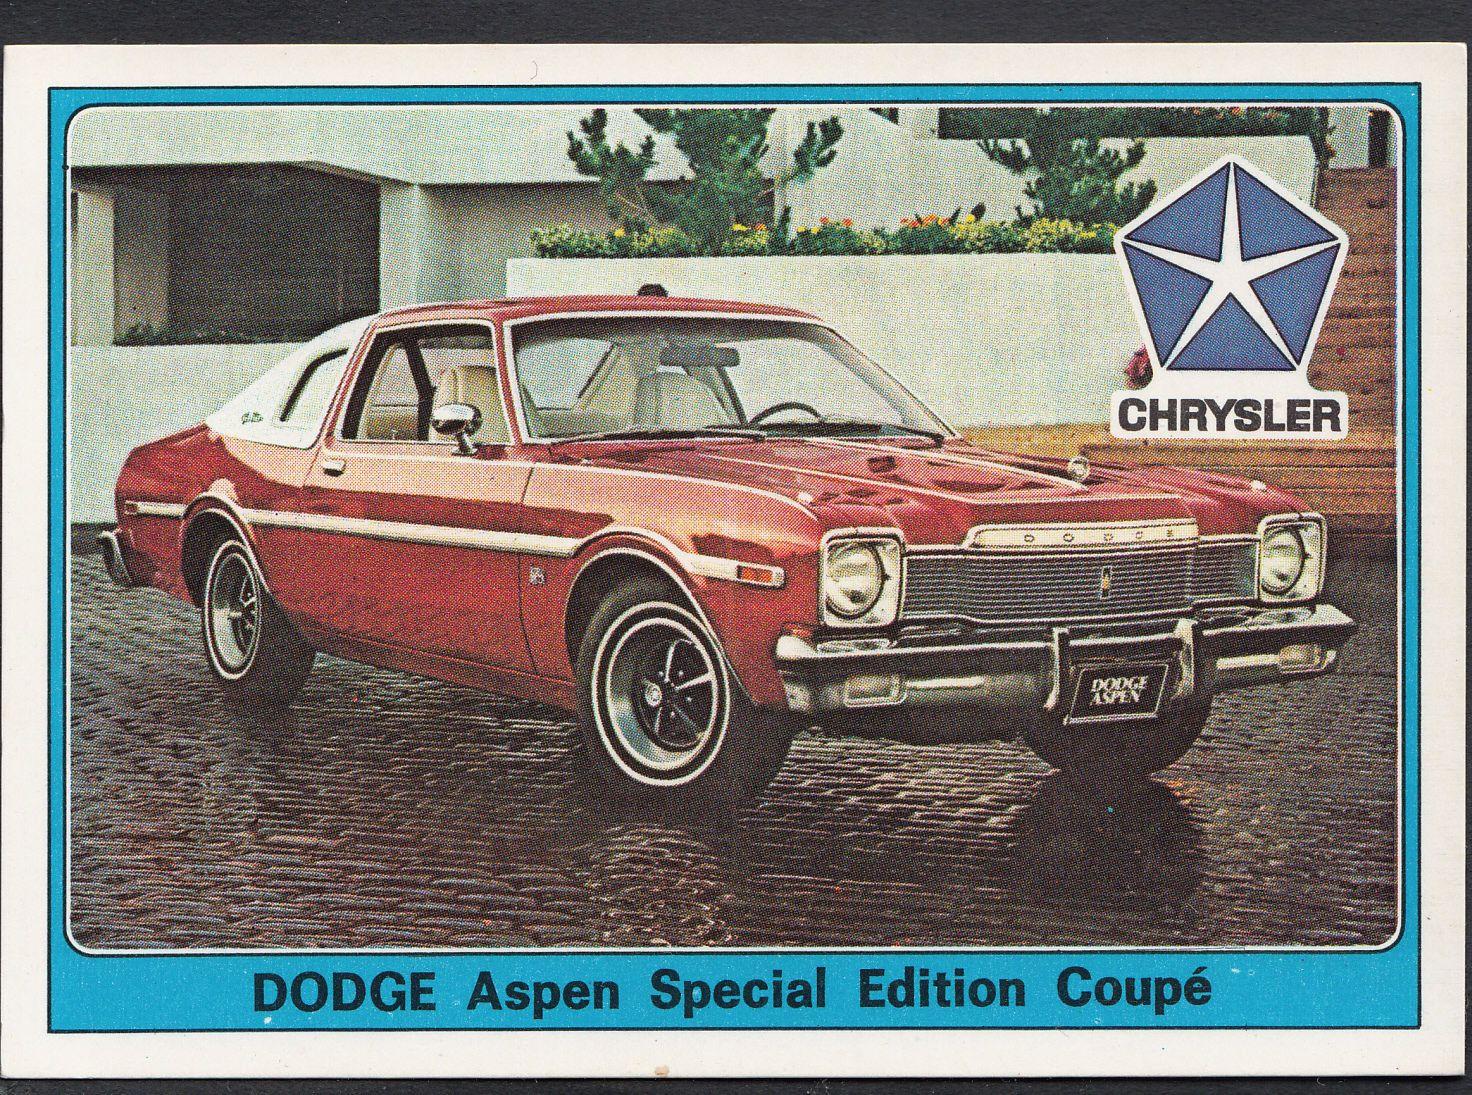 Panini Super Auto 1977 Sticker No 83 Vintage Car Chrysler Dodge Aspen Dodge Aspen Chrysler Vintage Cars [ 1095 x 1472 Pixel ]